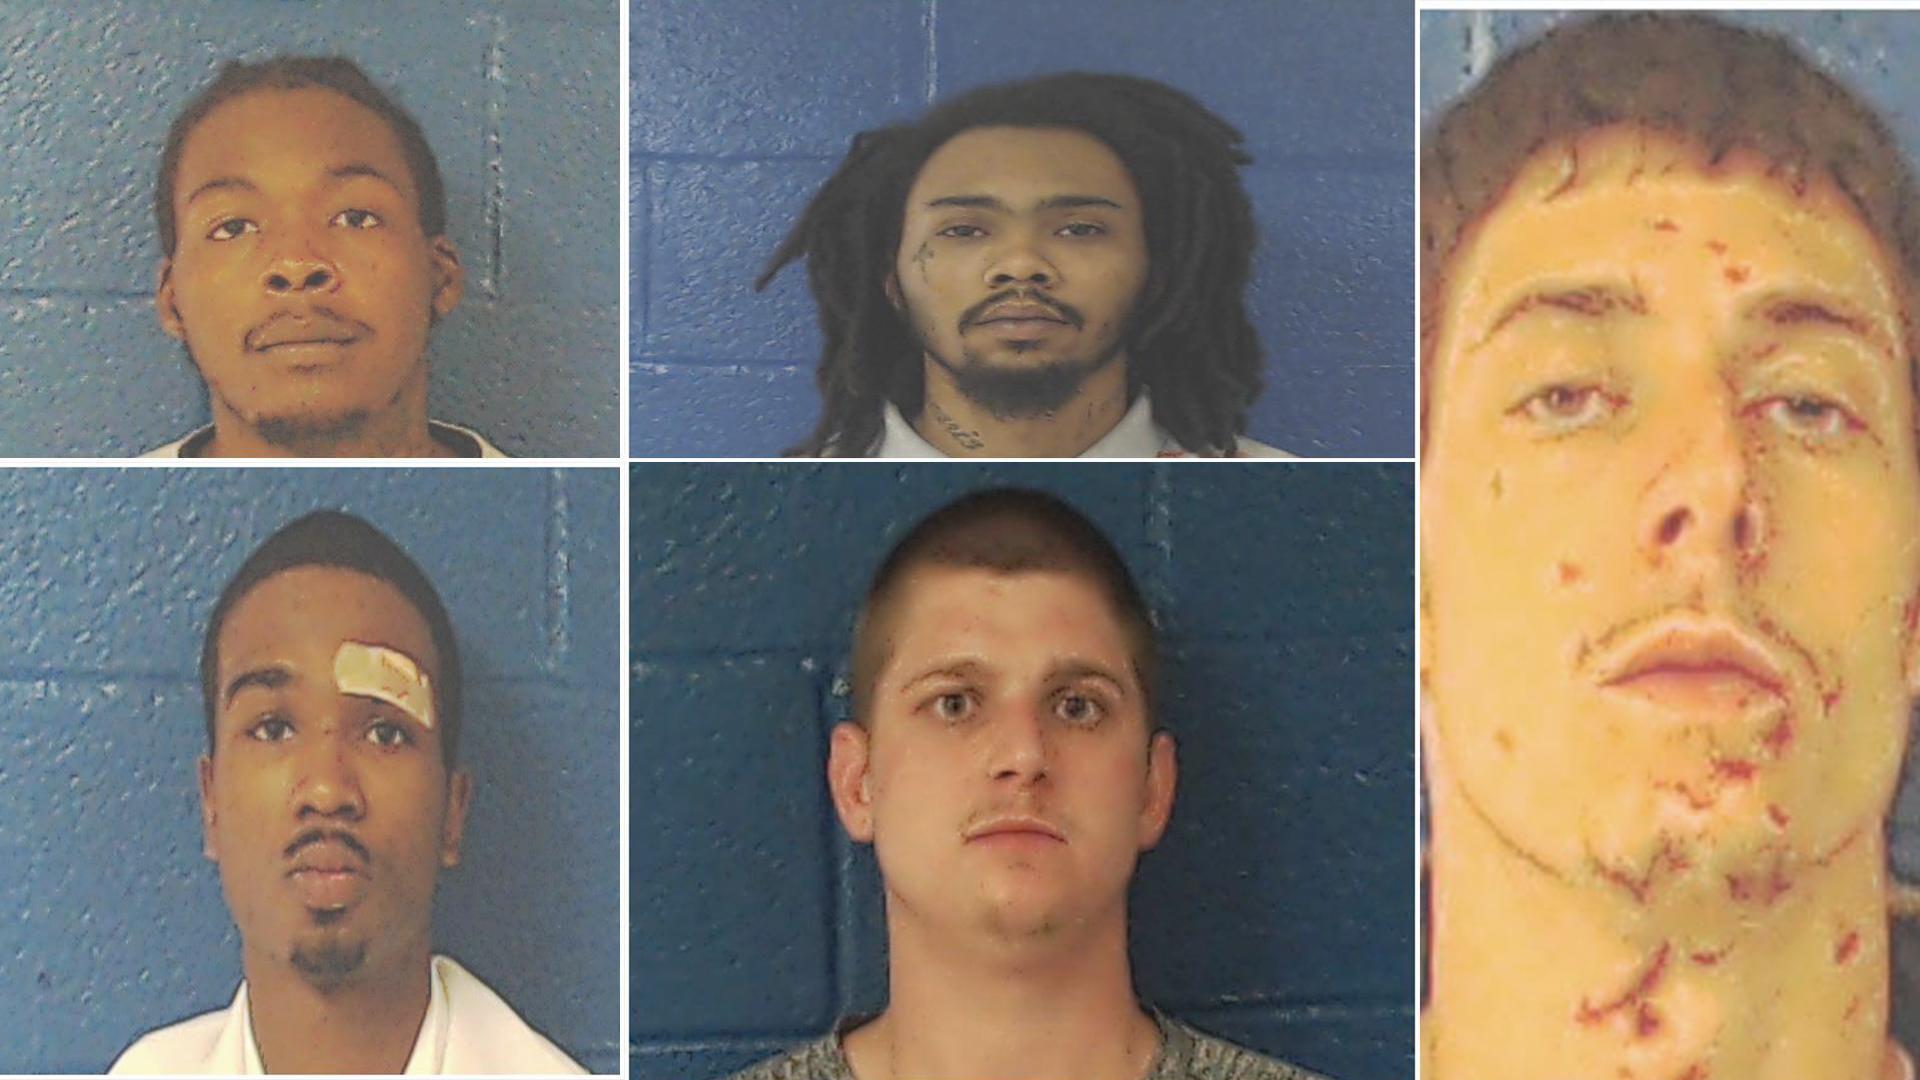 5 inmates breakout of North Carolina jail_1553551194485.jpg.jpg